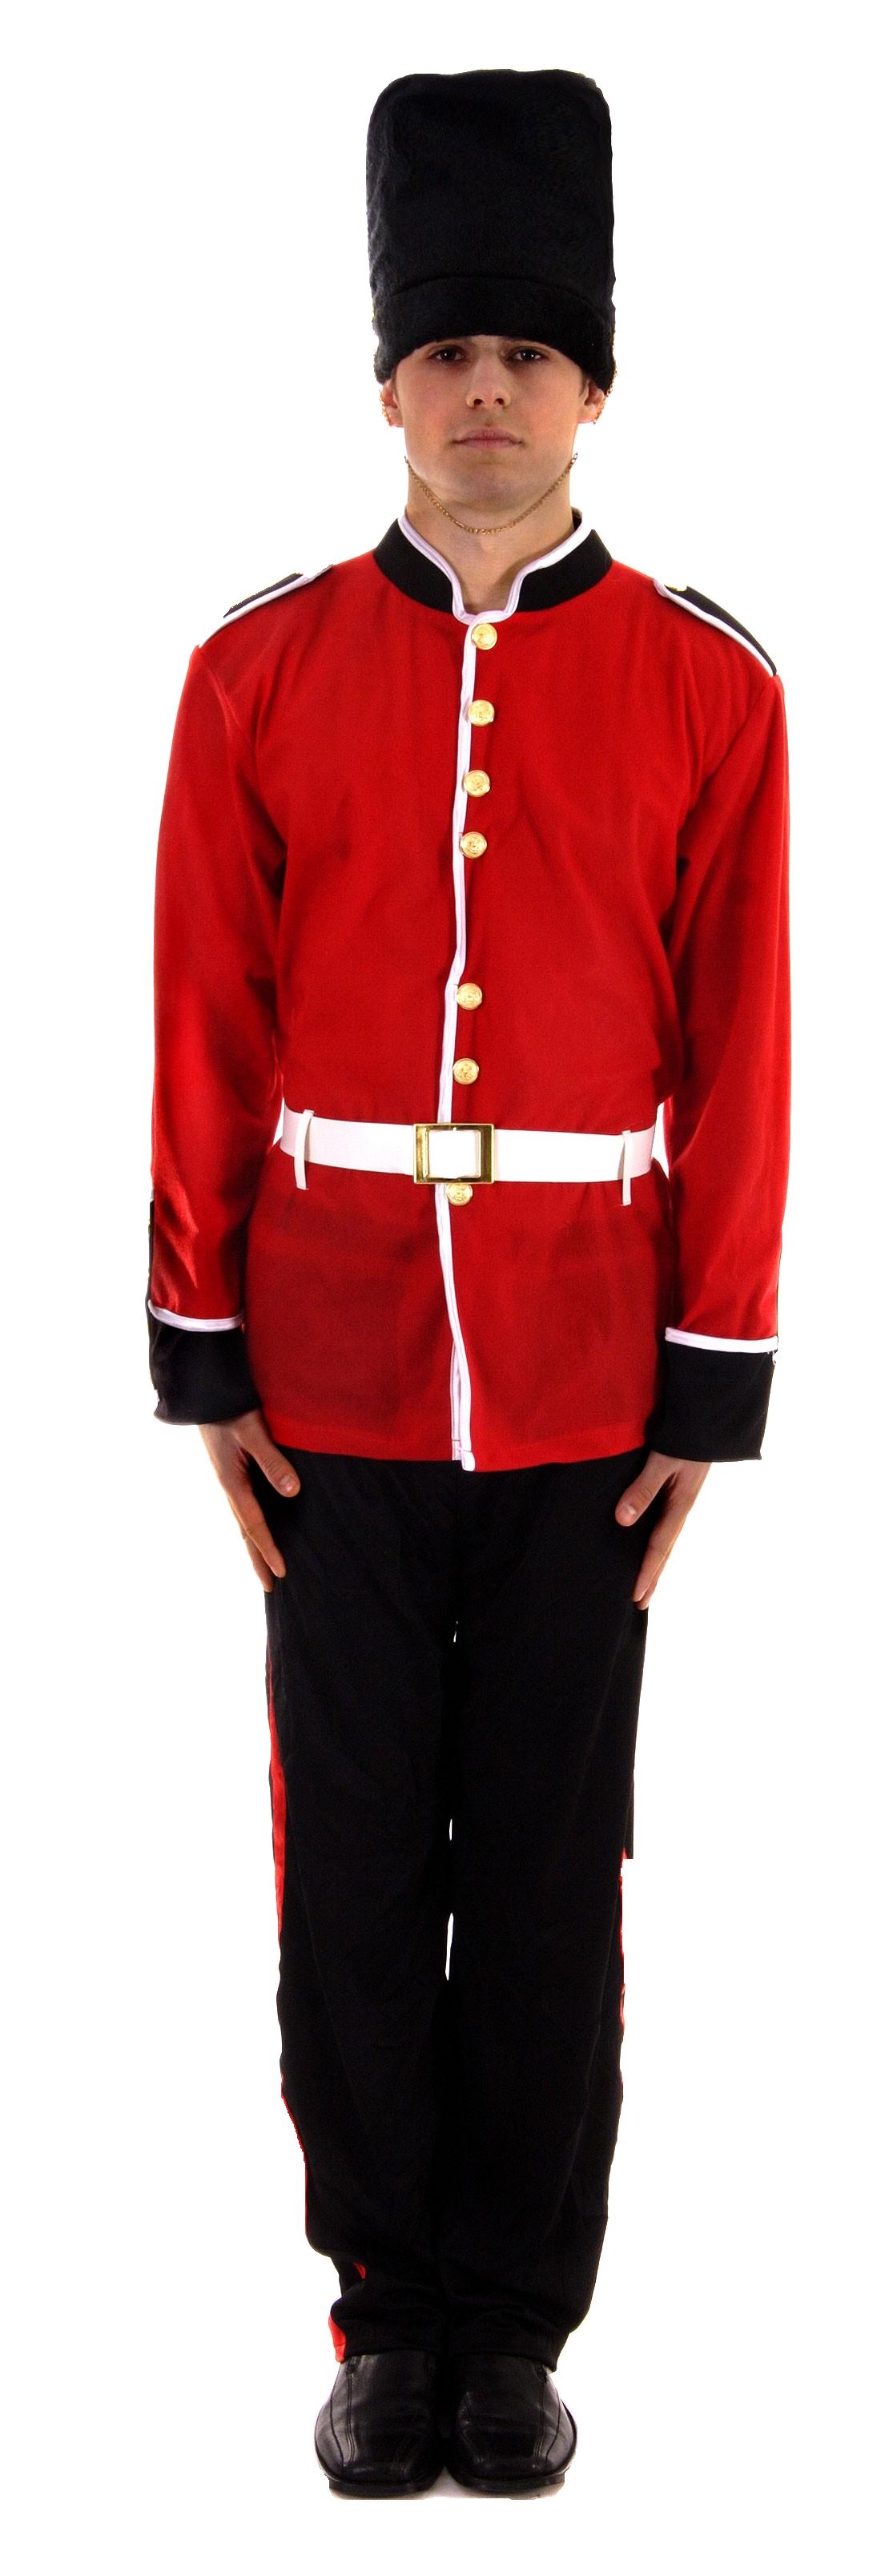 British Royal Guard Uniform 17